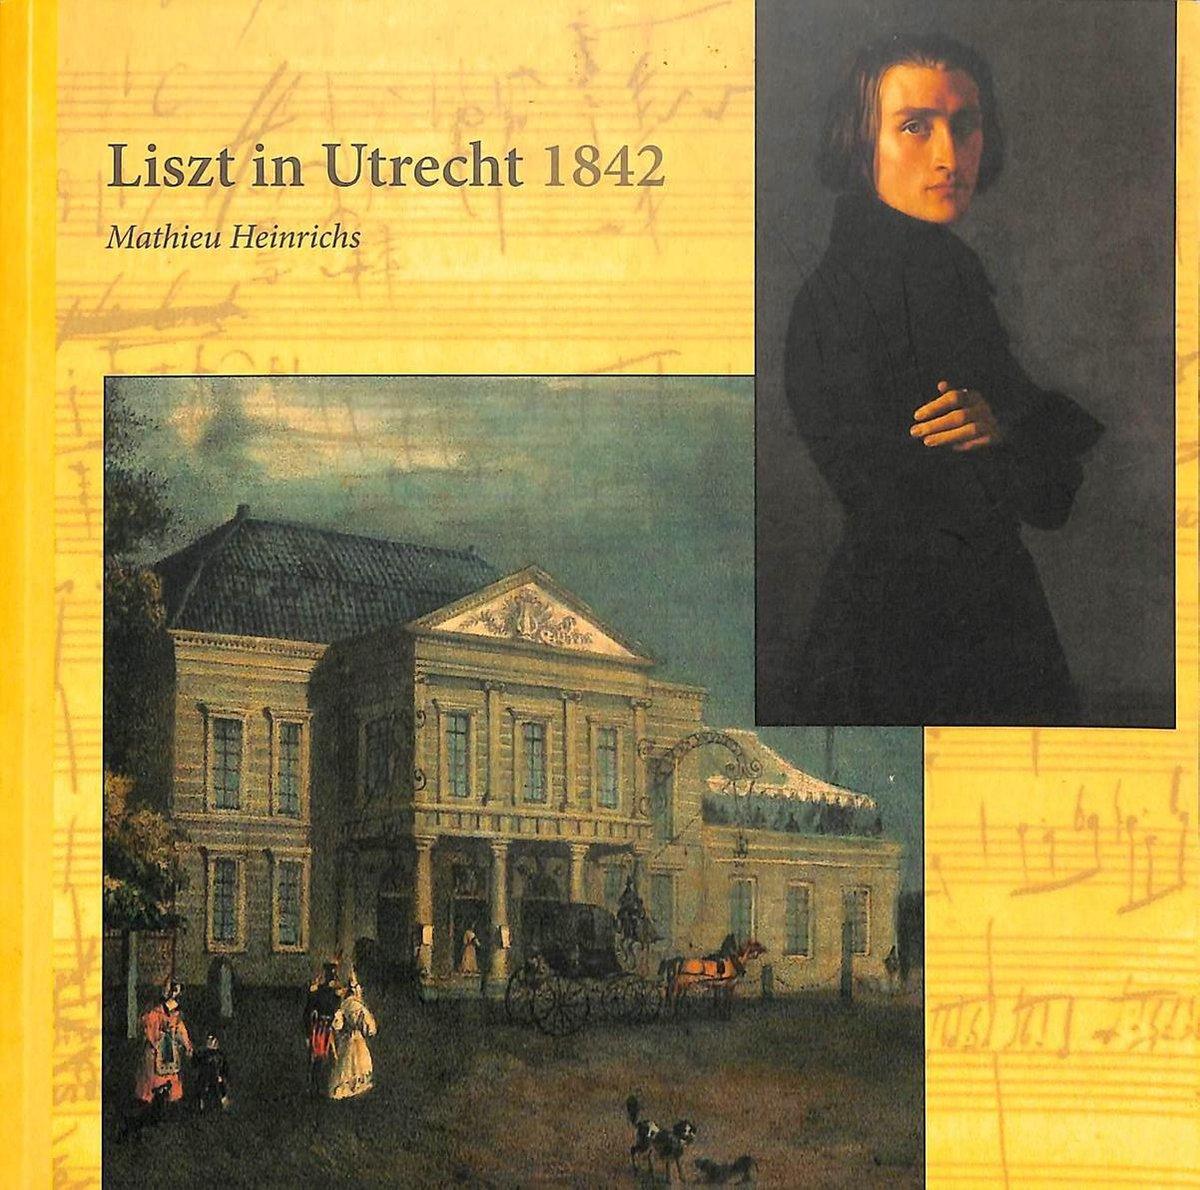 Liszt in Utrecht 1842